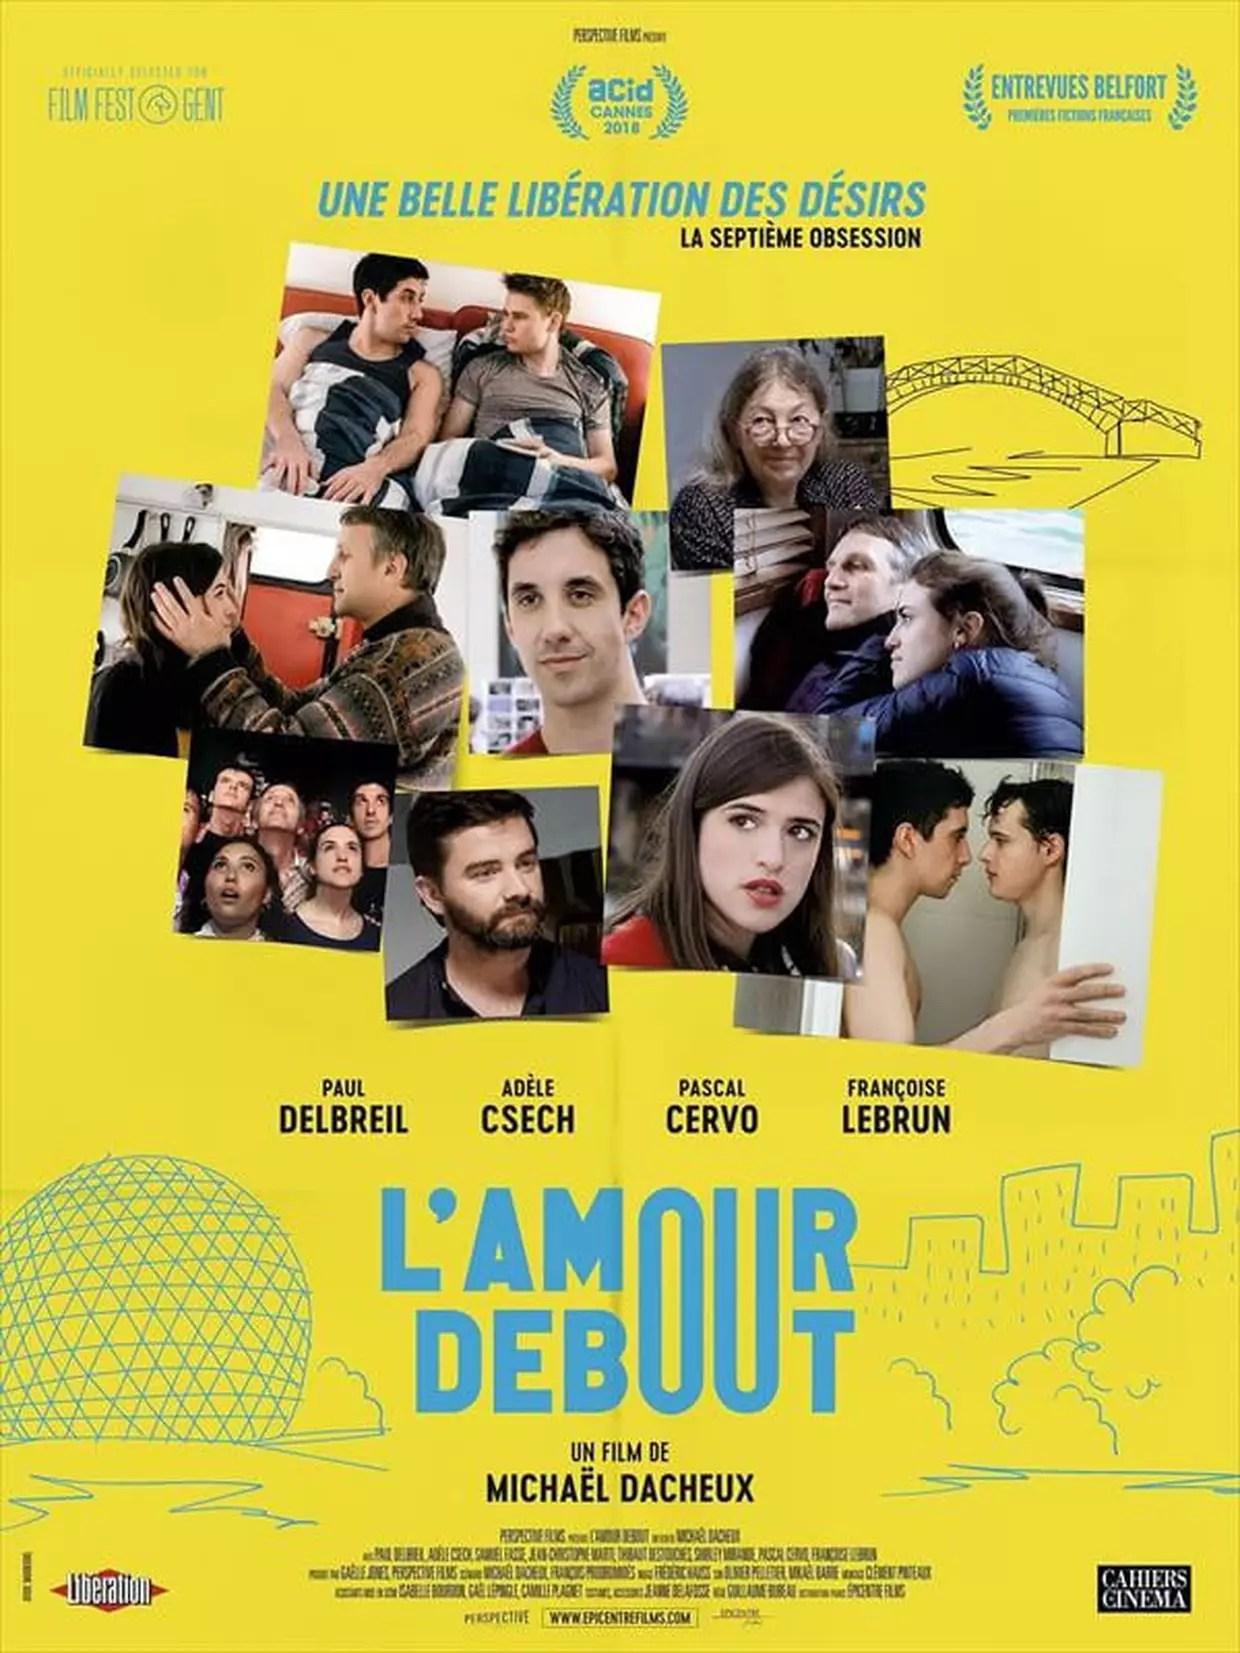 L'amour Debout Bande Annonce : l'amour, debout, bande, annonce, L'Amour, Debout, Bande, Annonce, Film,, Séances,, Streaming,, Sortie,